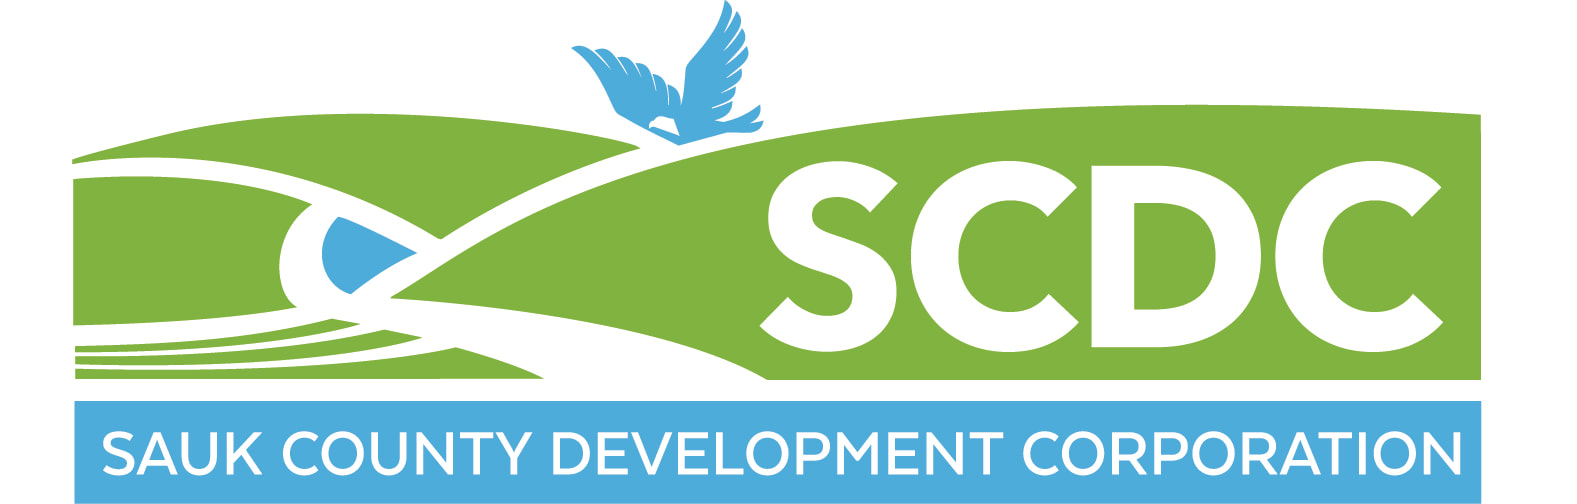 scdc-final-logo-cmyk_orig.jpg